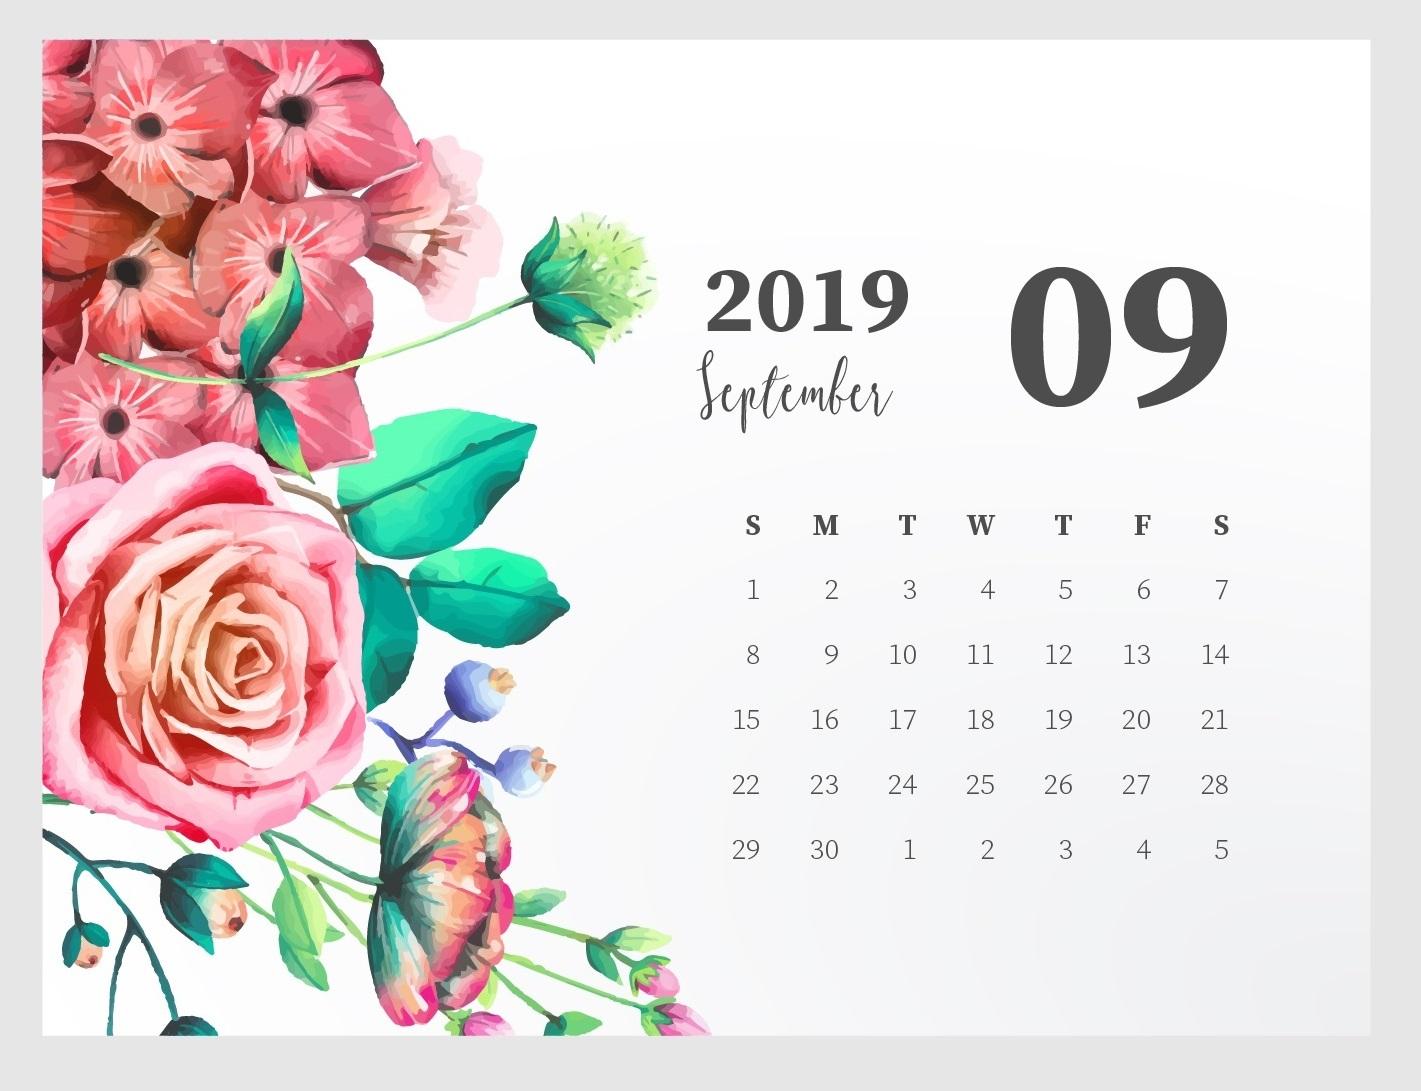 Cute September 2019 Calendar Design